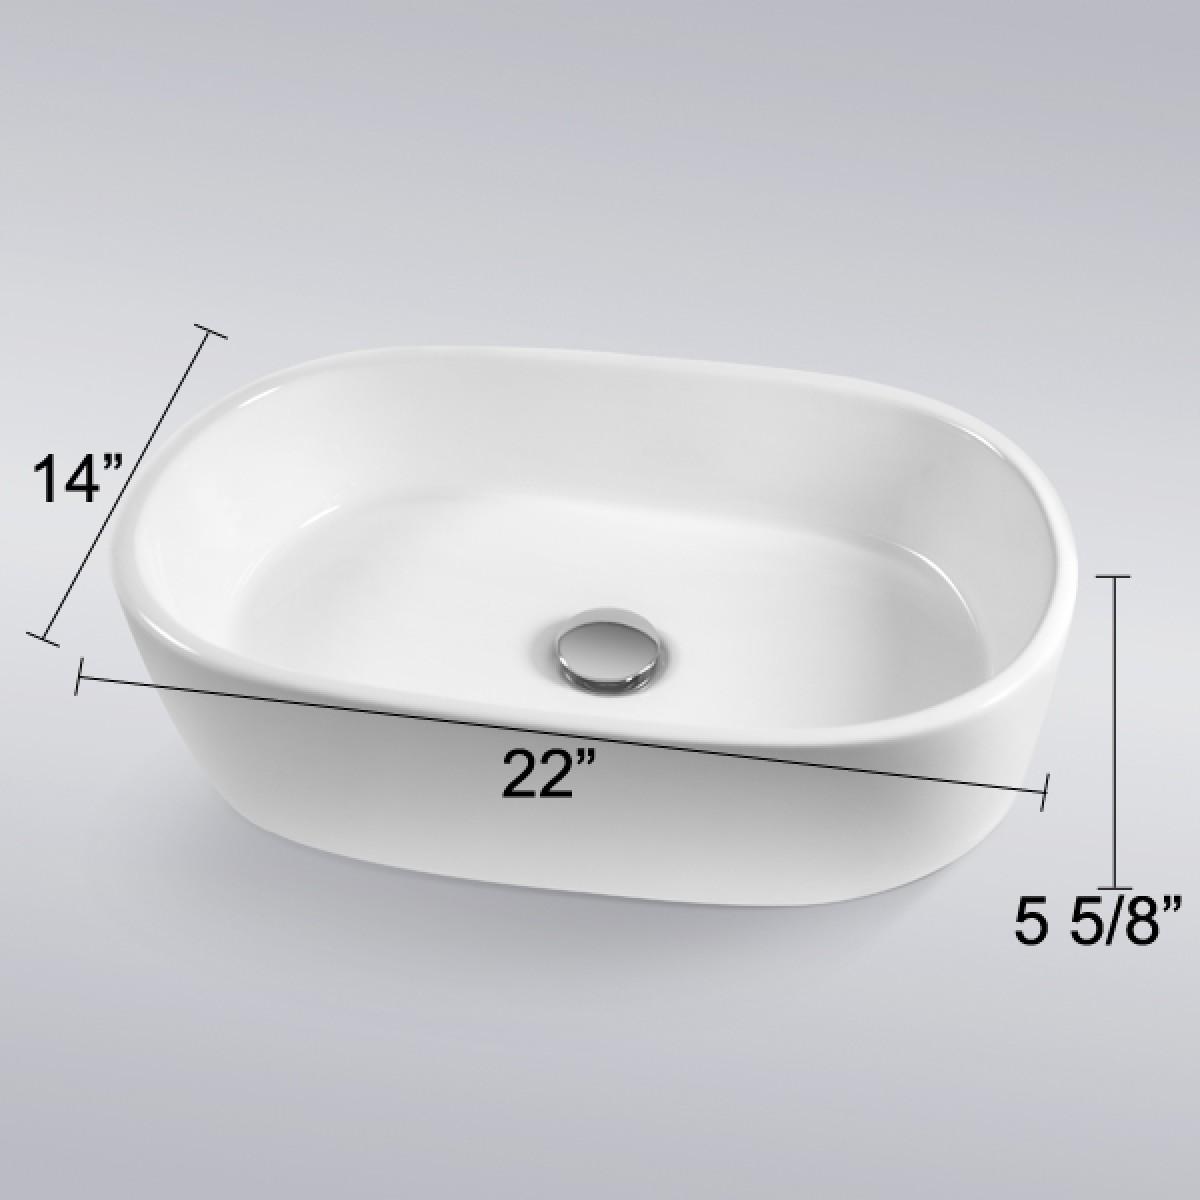 European Style Oval Shape Porcelain Ceramic Bathroom Vessel Sink